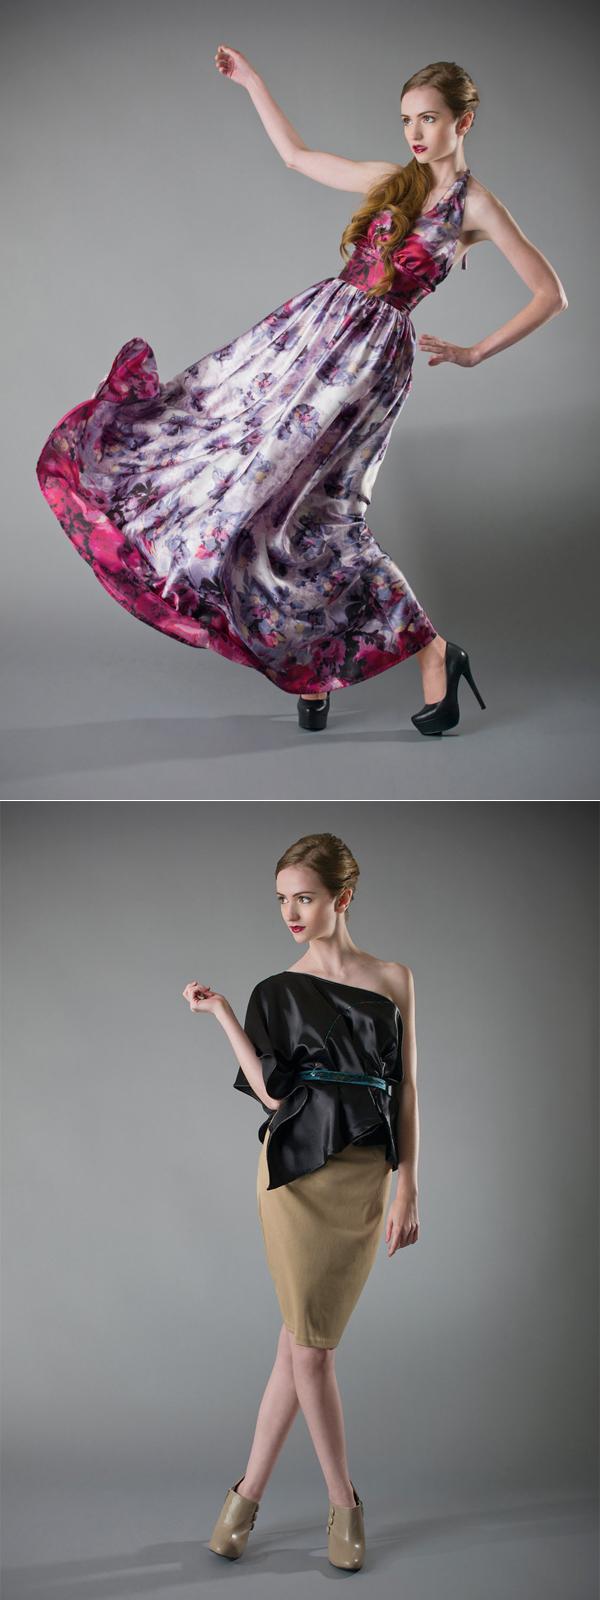 Aug 16, 2011 Carolina Soma (Designer), Alex Frazier (Photographer), Katie Cotton (Hair/Makeup)